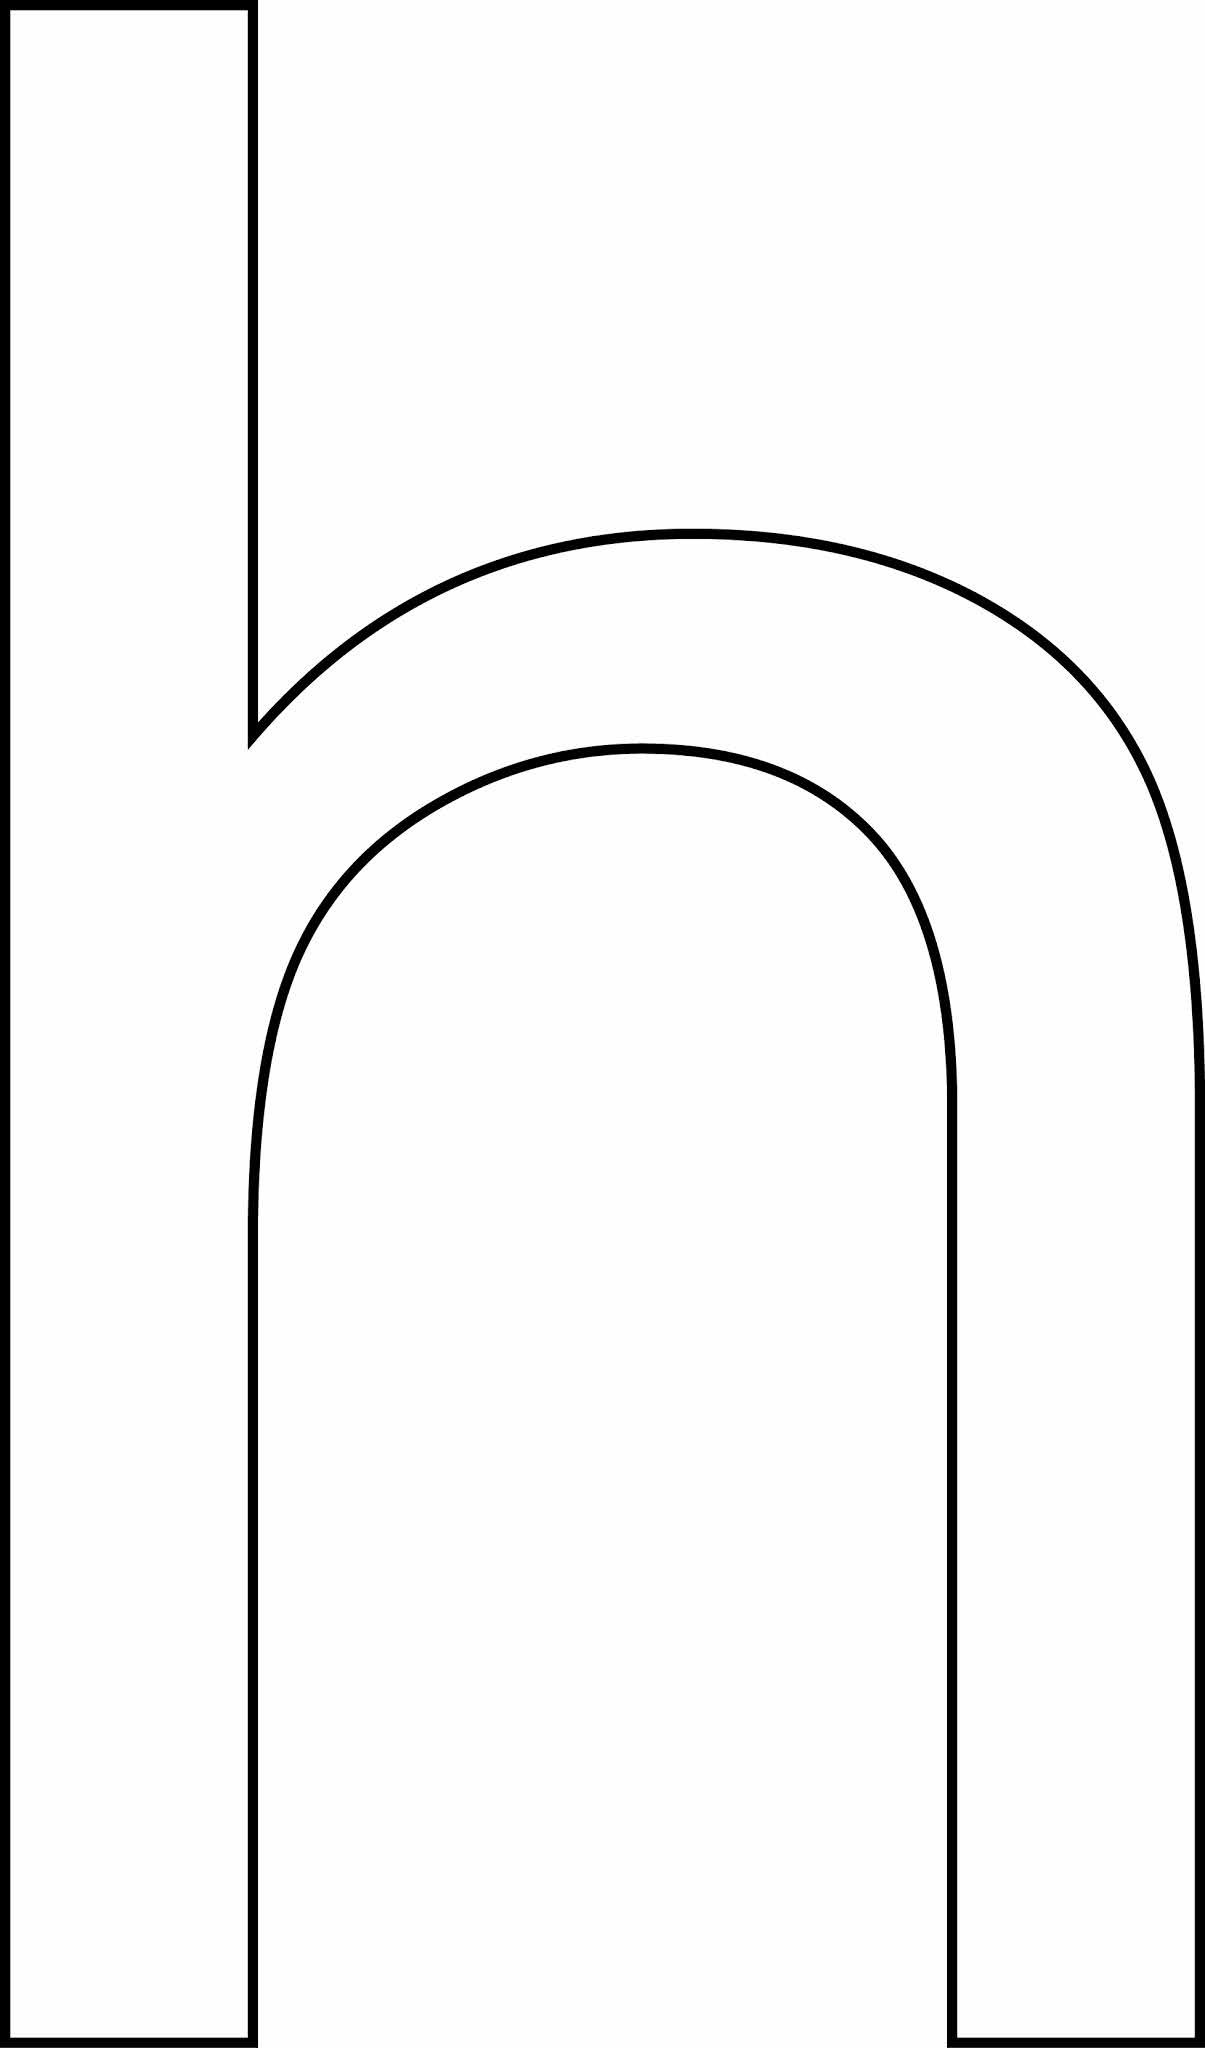 Letra h - minúscula para imprimir